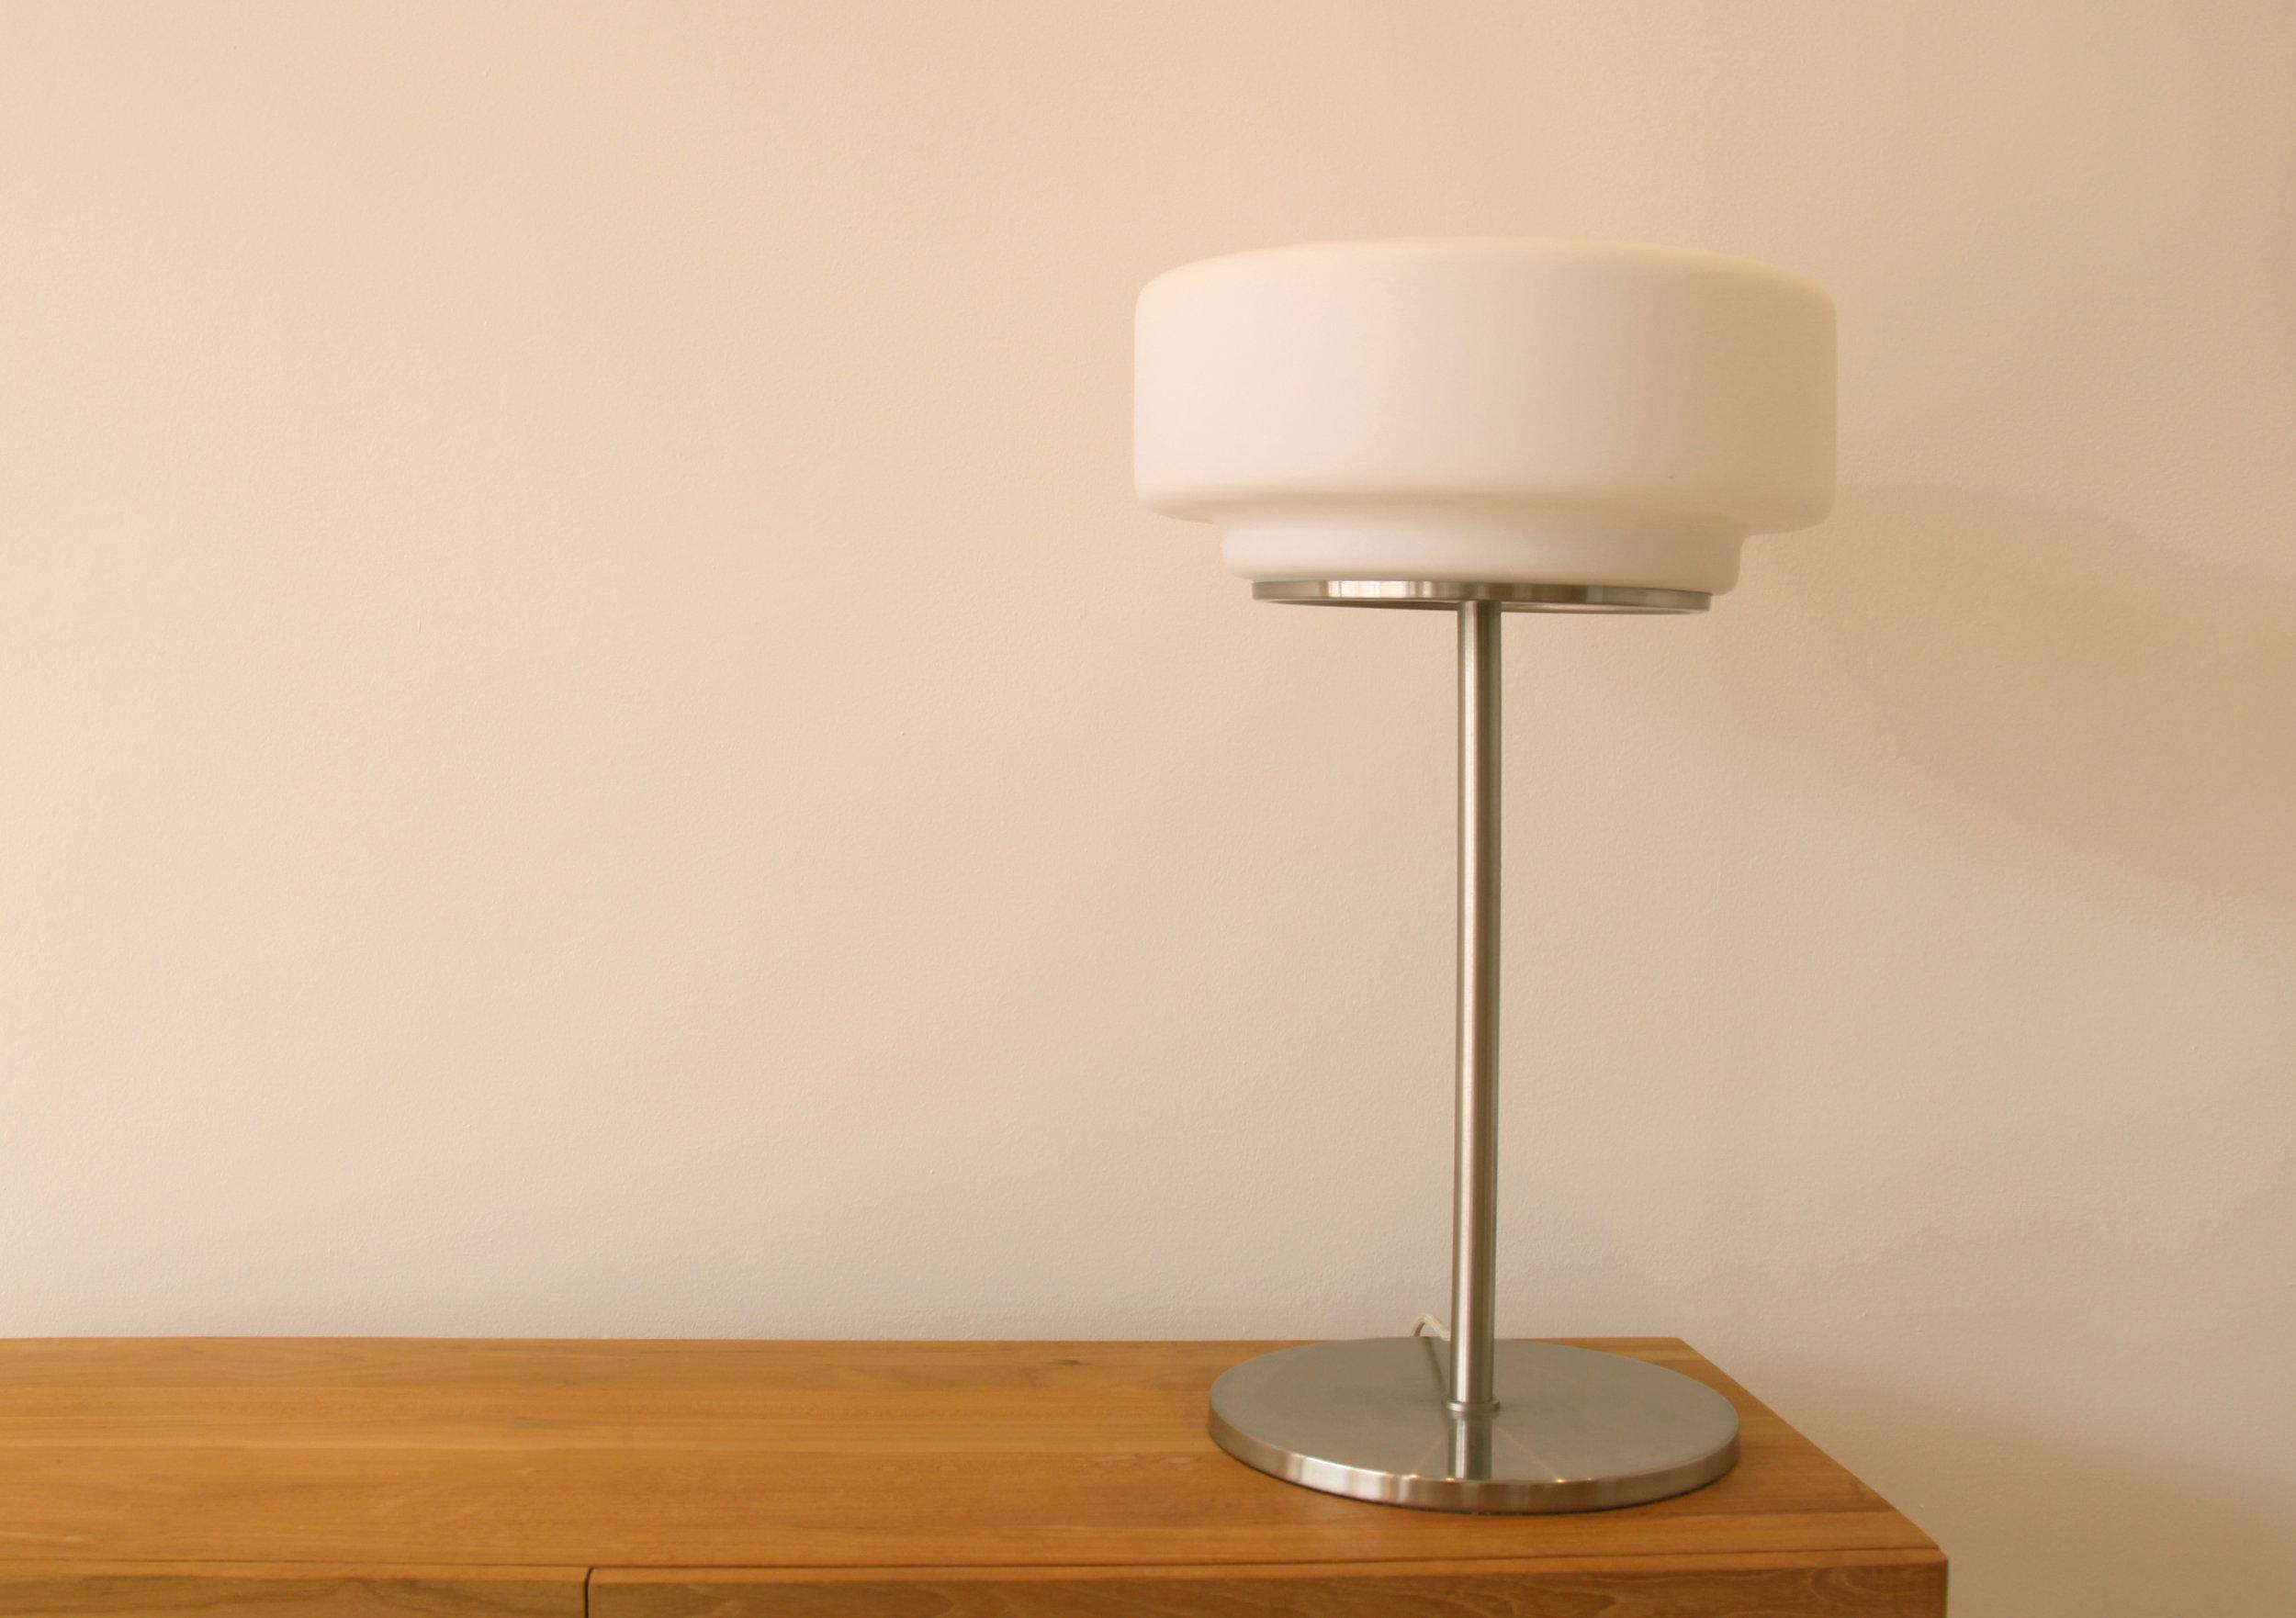 Fifth Avenue Lamp 4.jpg